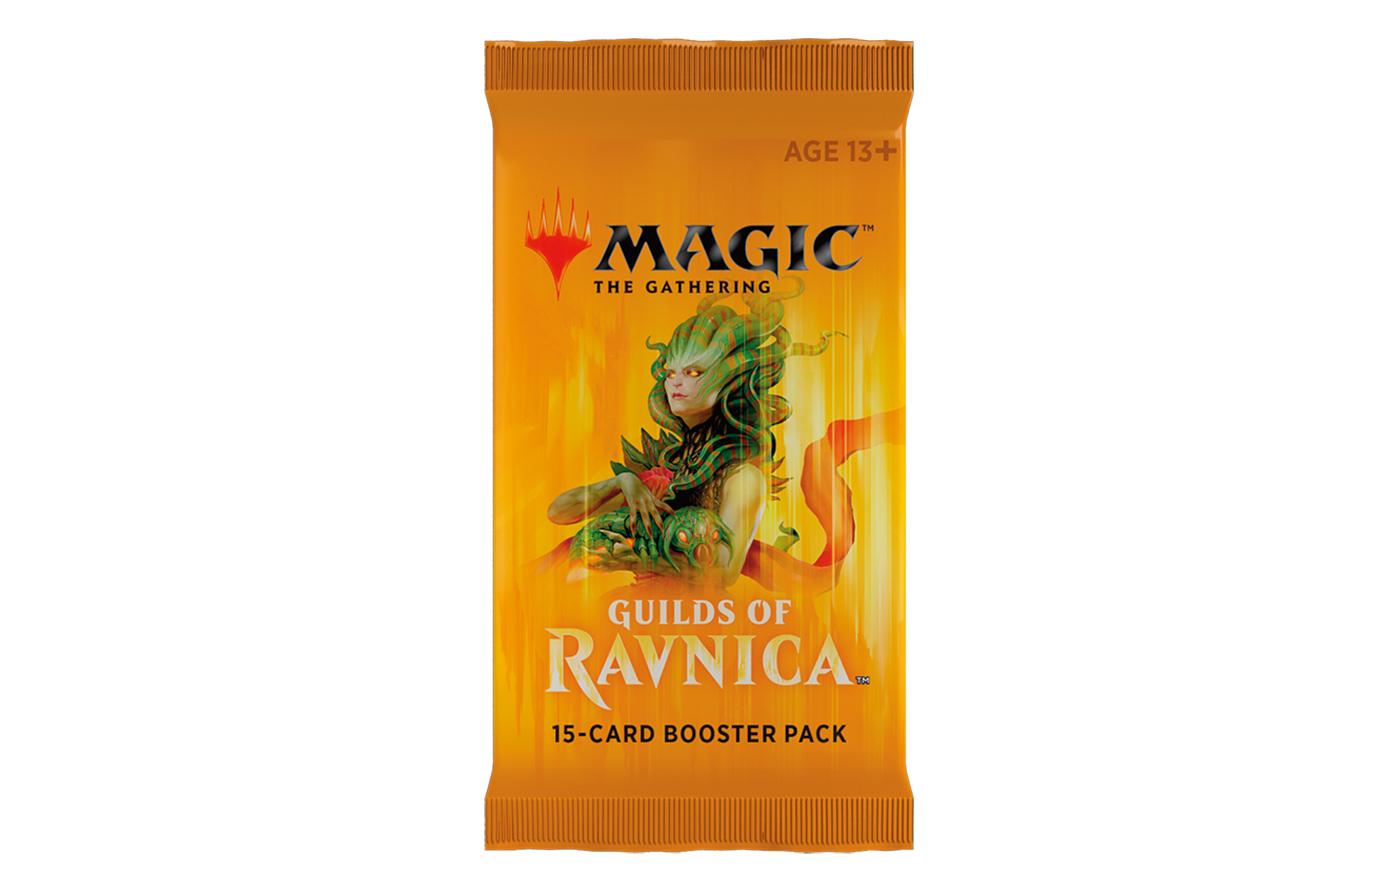 Guilds of Ravnica Booster Pack